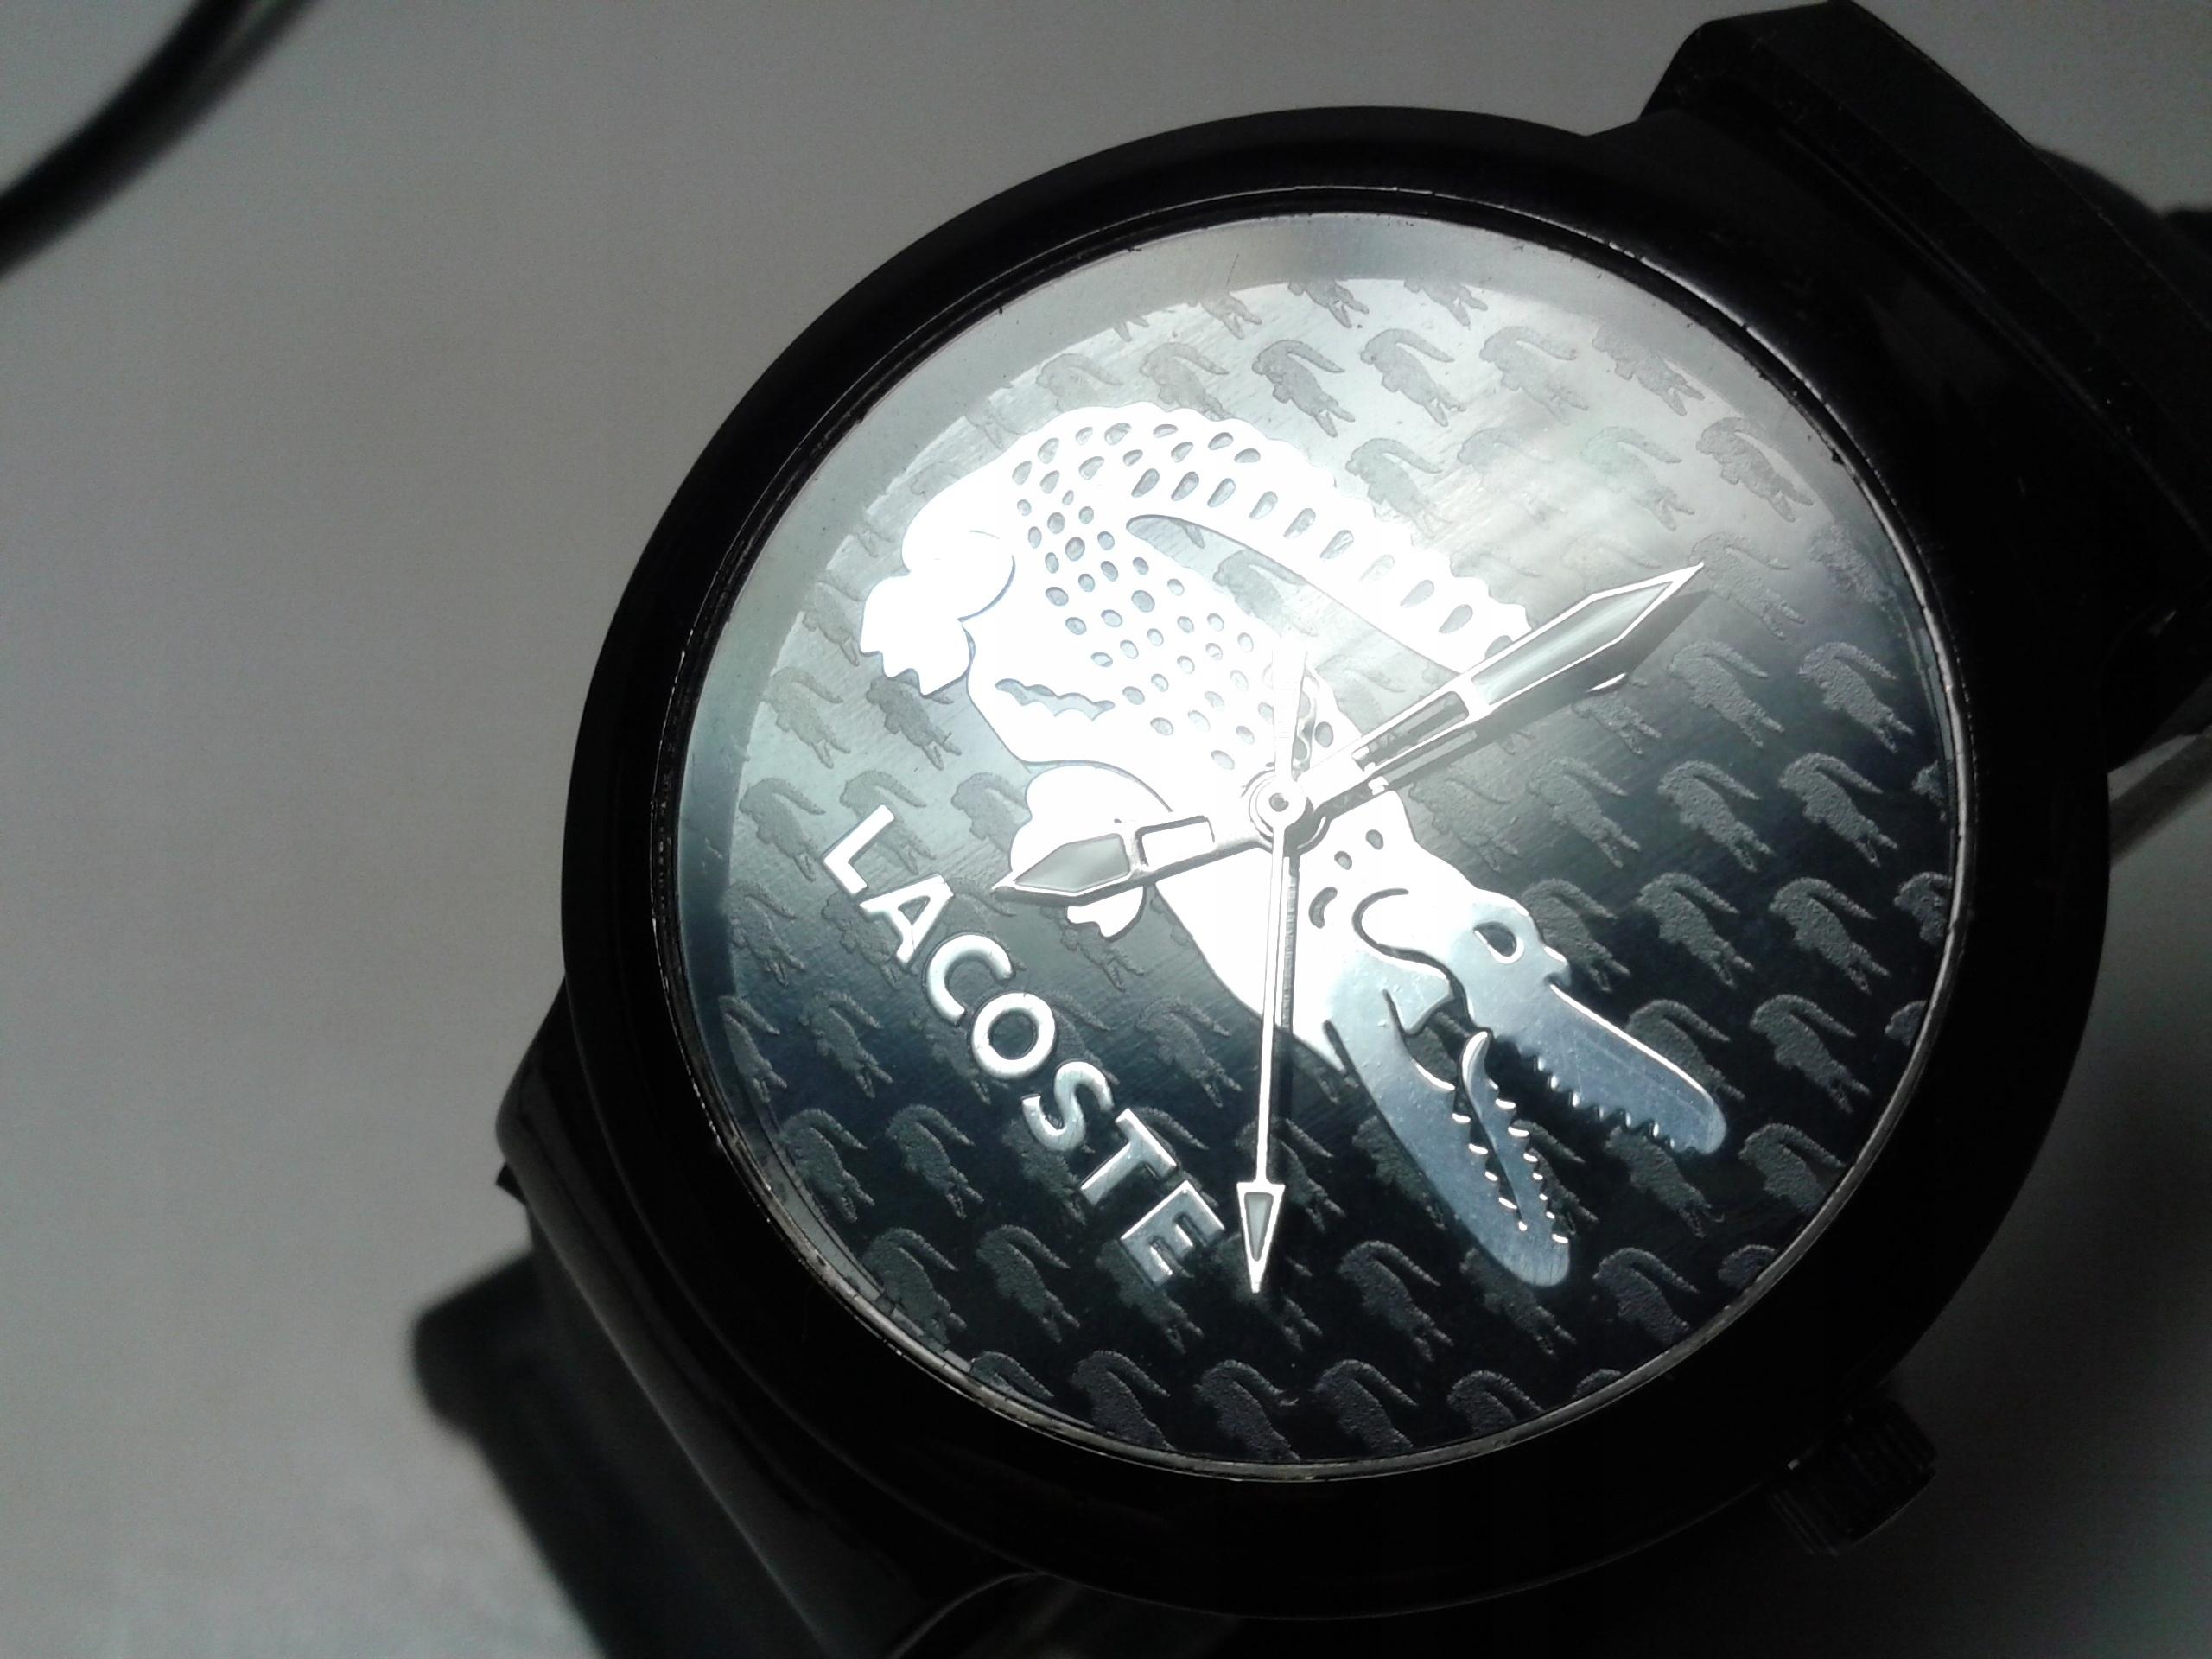 Zegarek LACOSTE Victoria srebrny krokodyl UNISEX